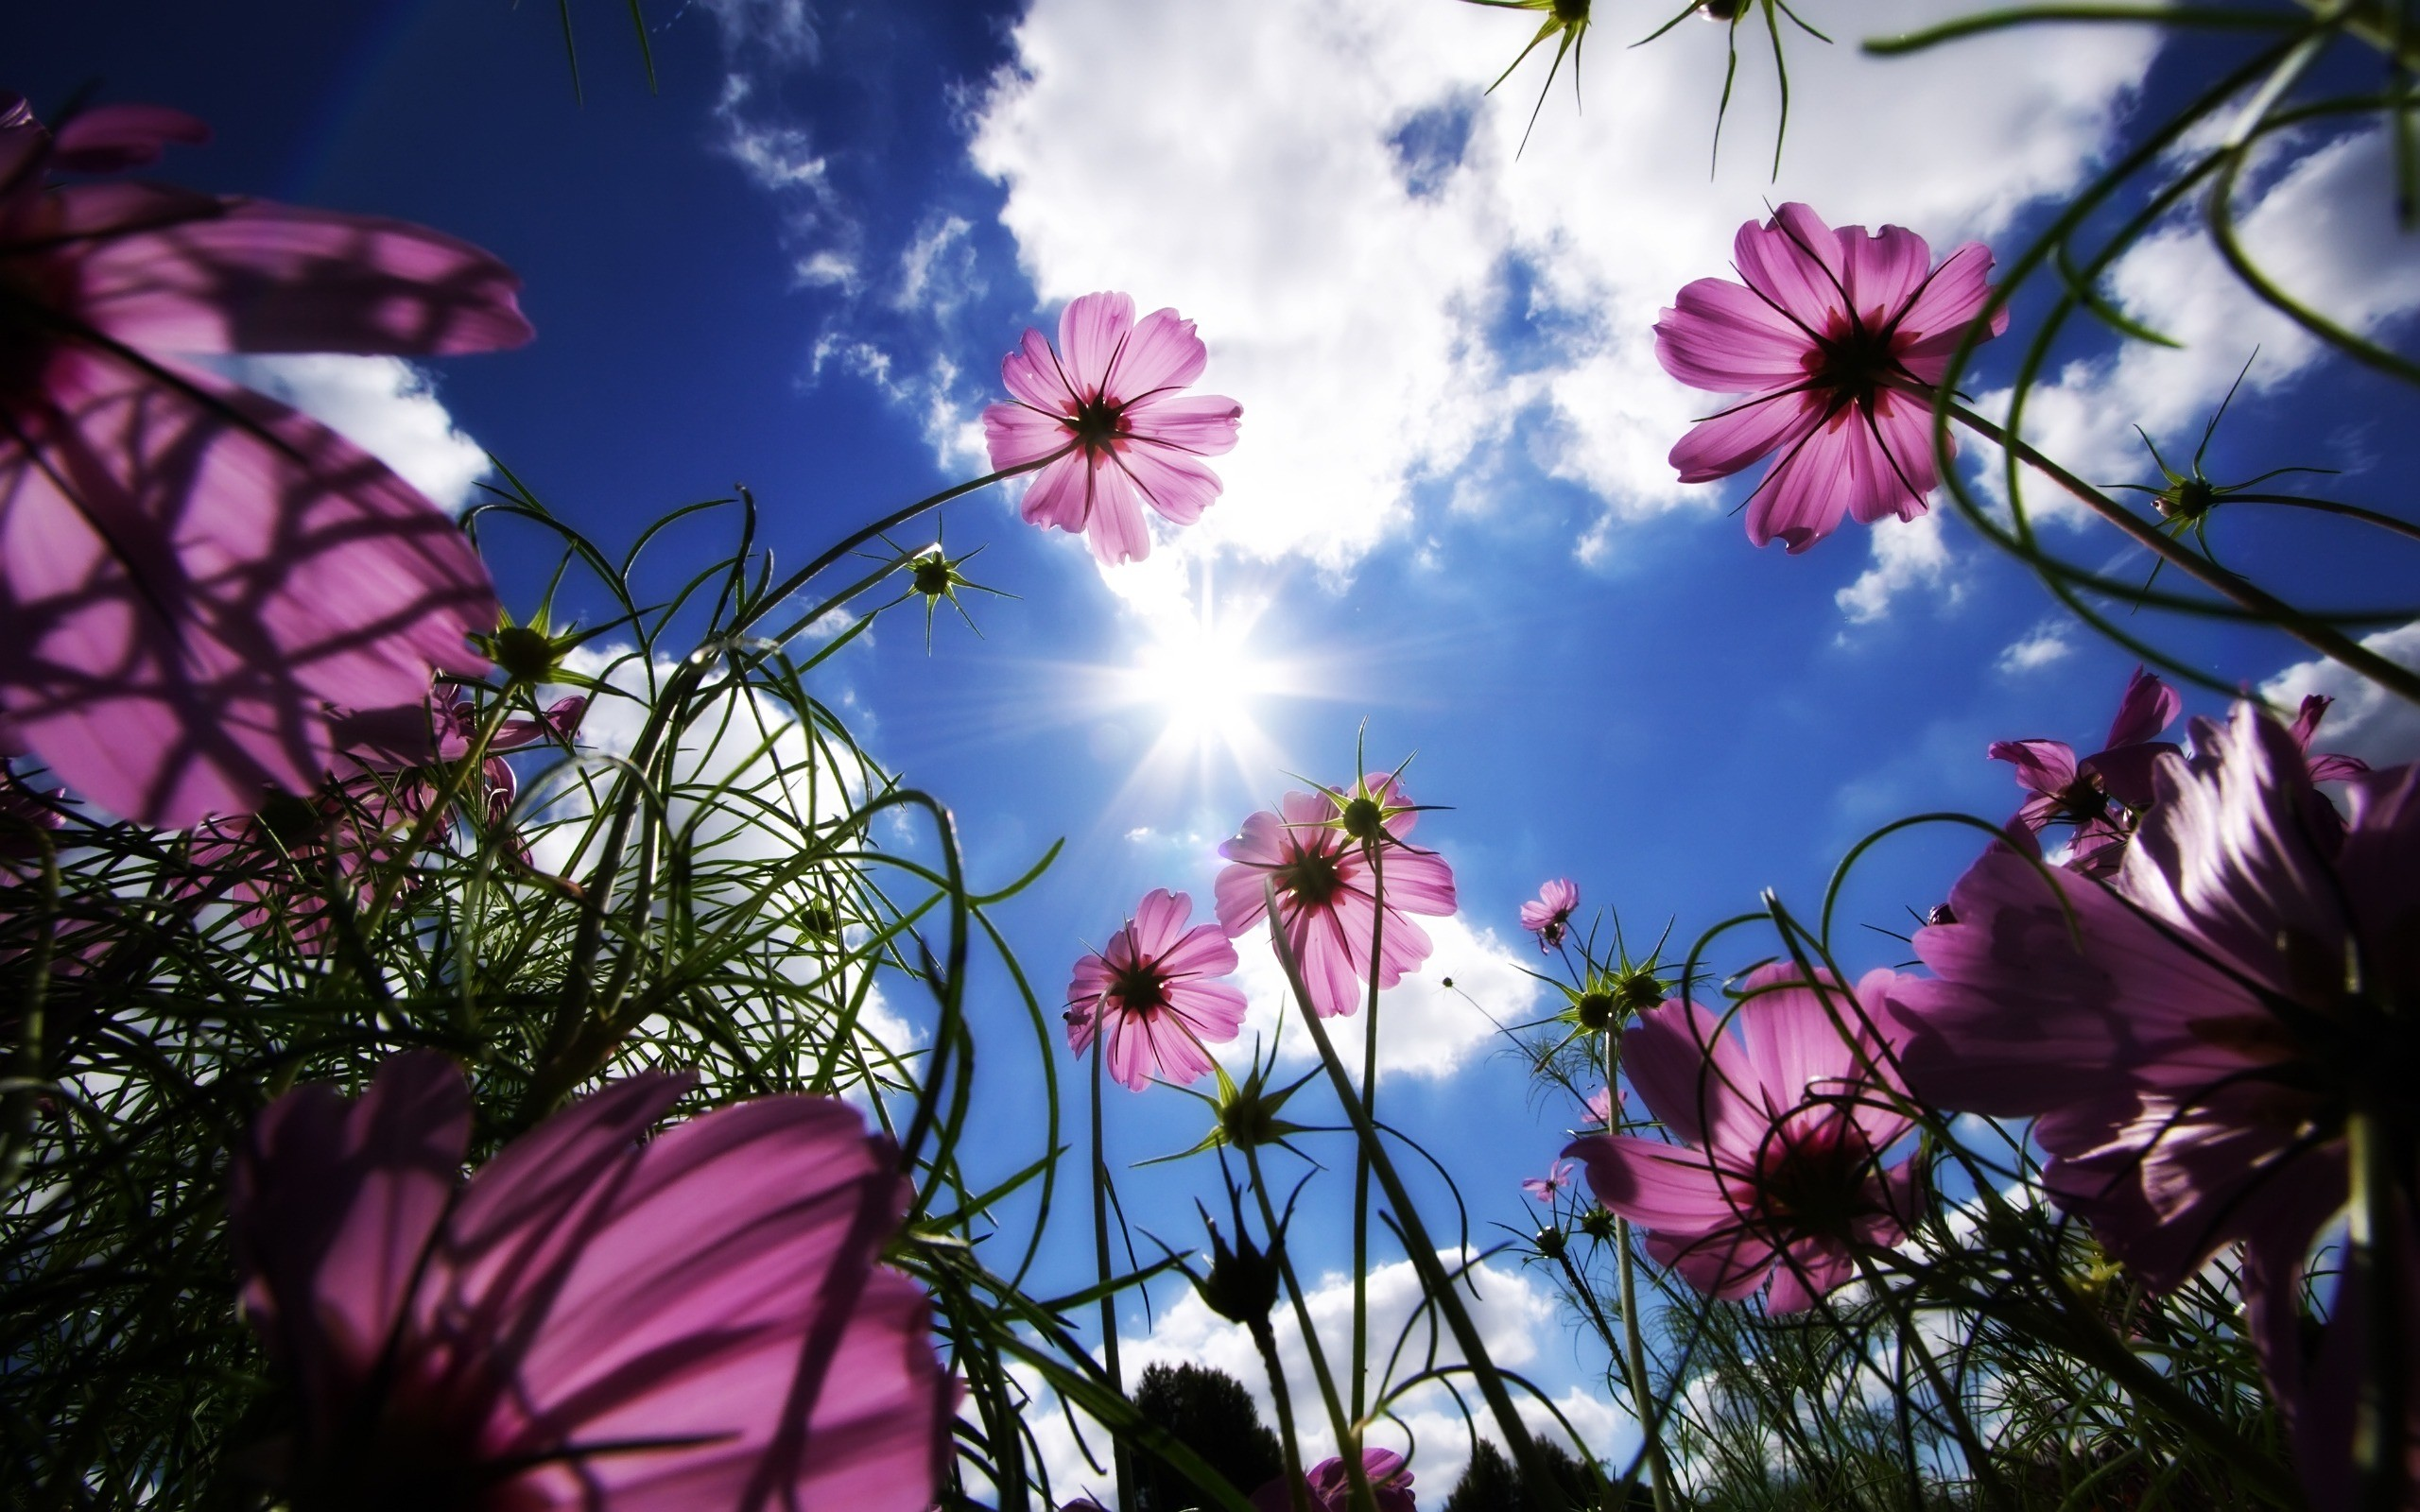 Sunny Flowers Wallpaper Flowers Nature